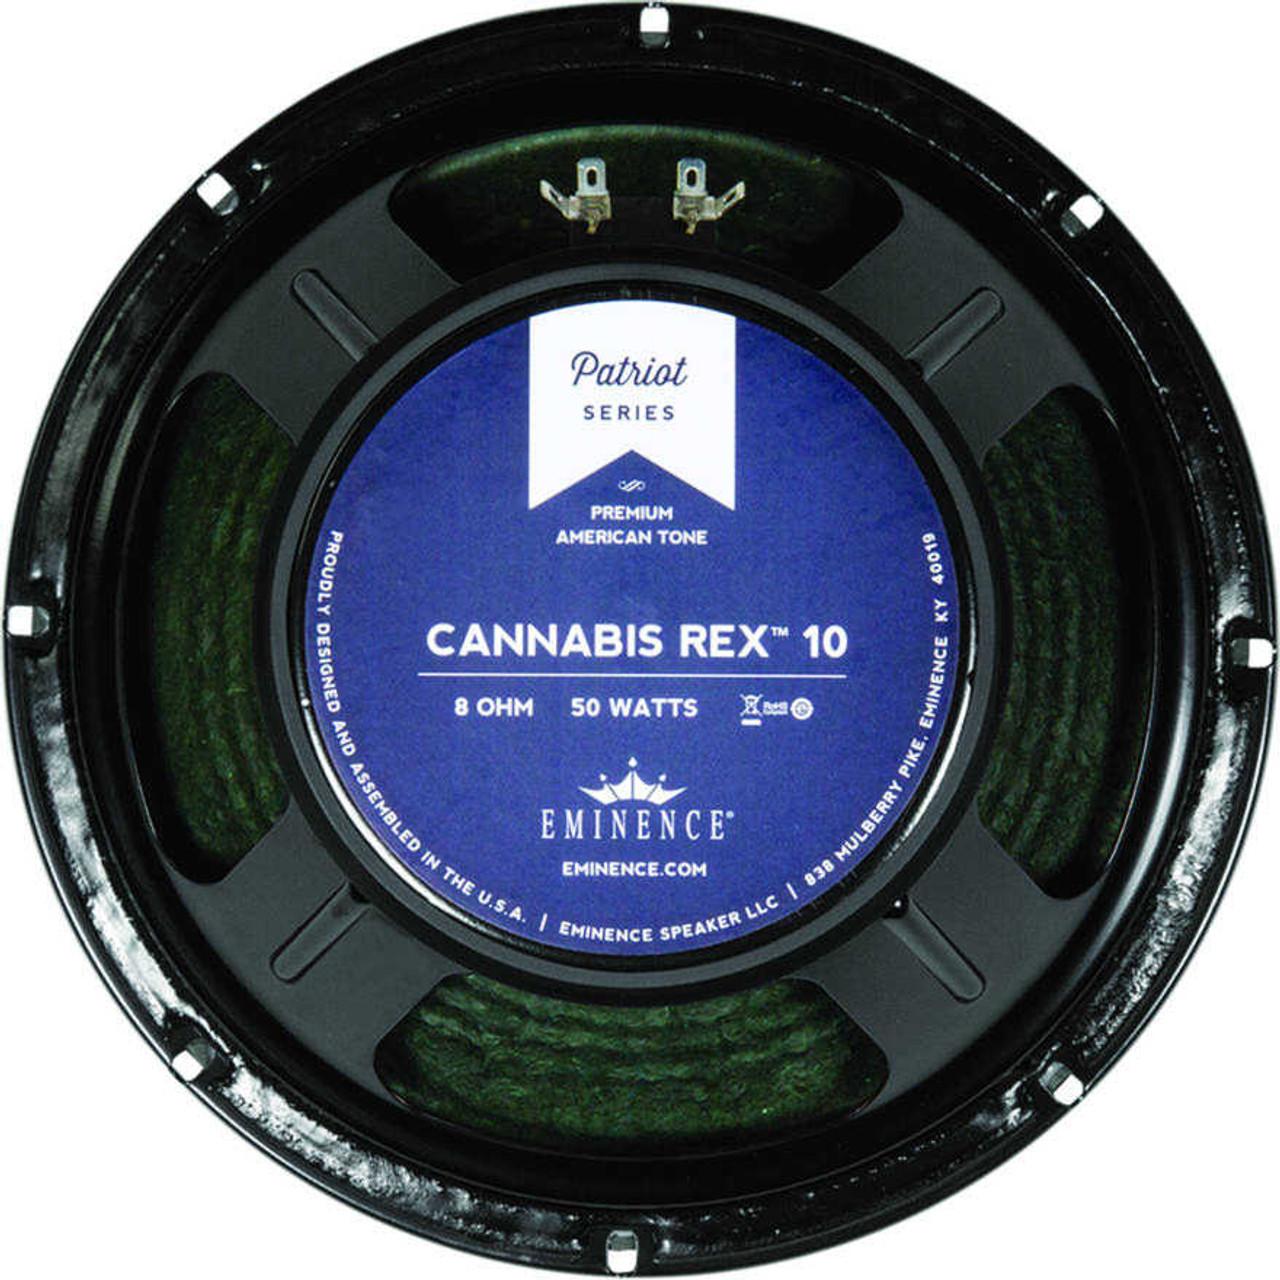 Eminence Cannabis Rex 10 - 50W 8ohms